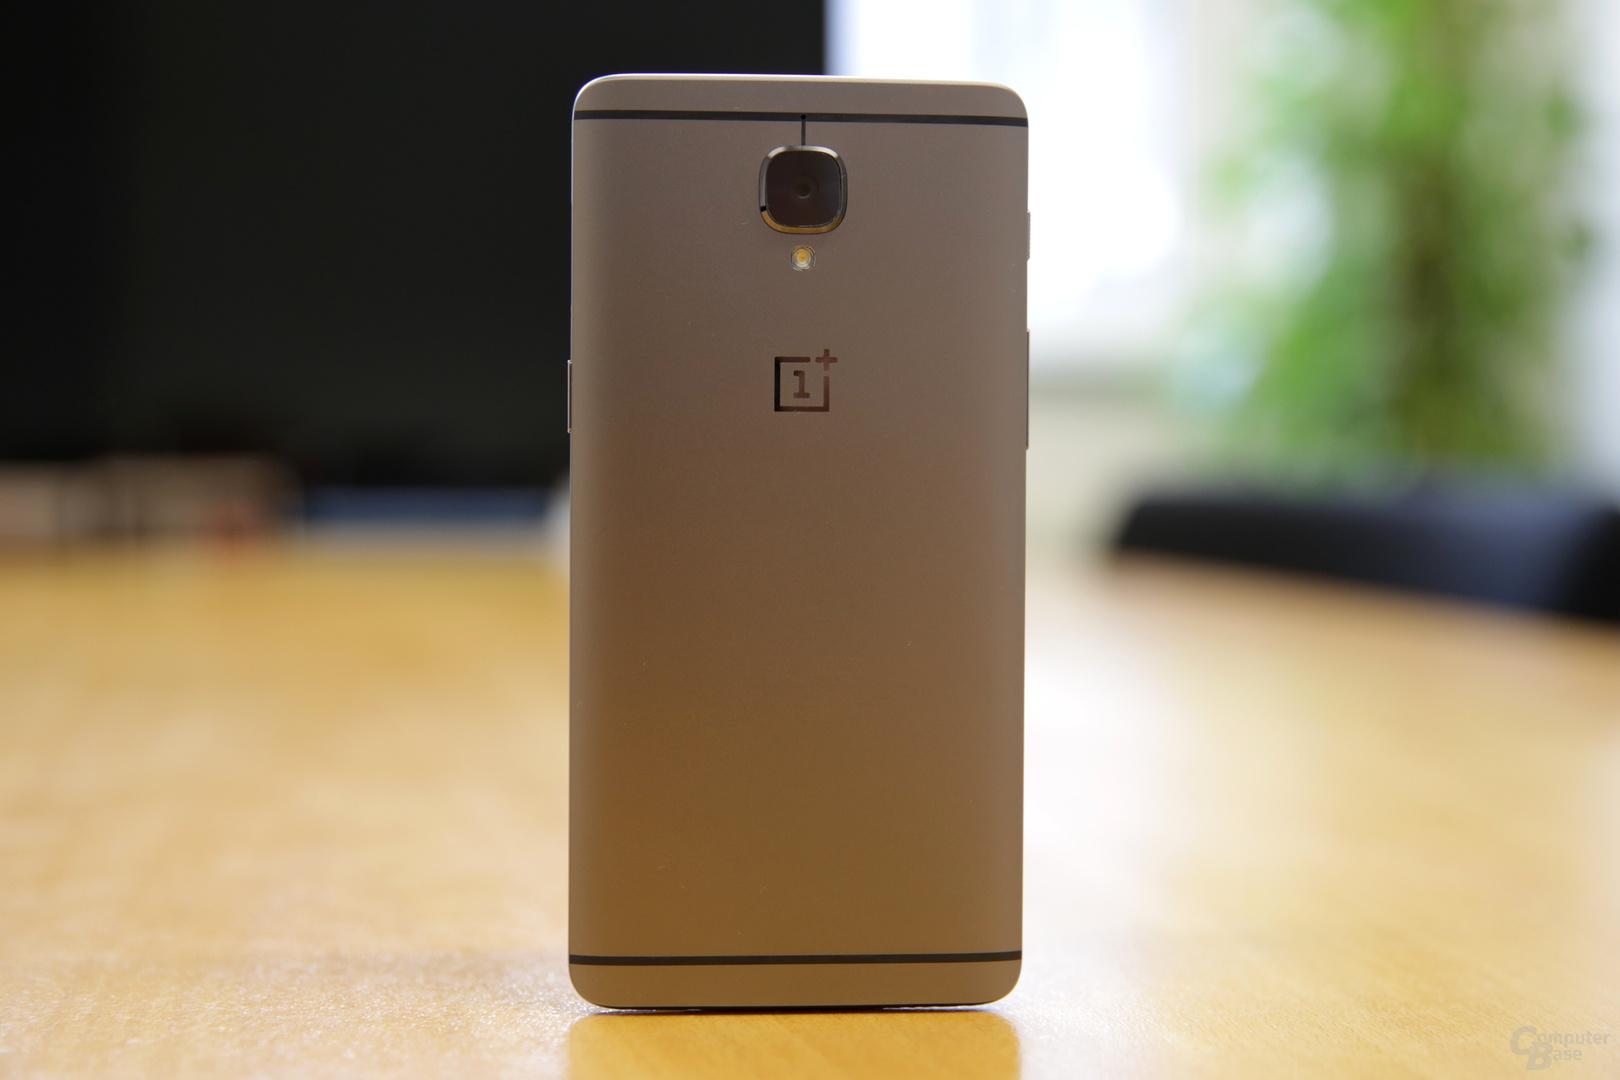 Rückseite mit OnePlus-Logo